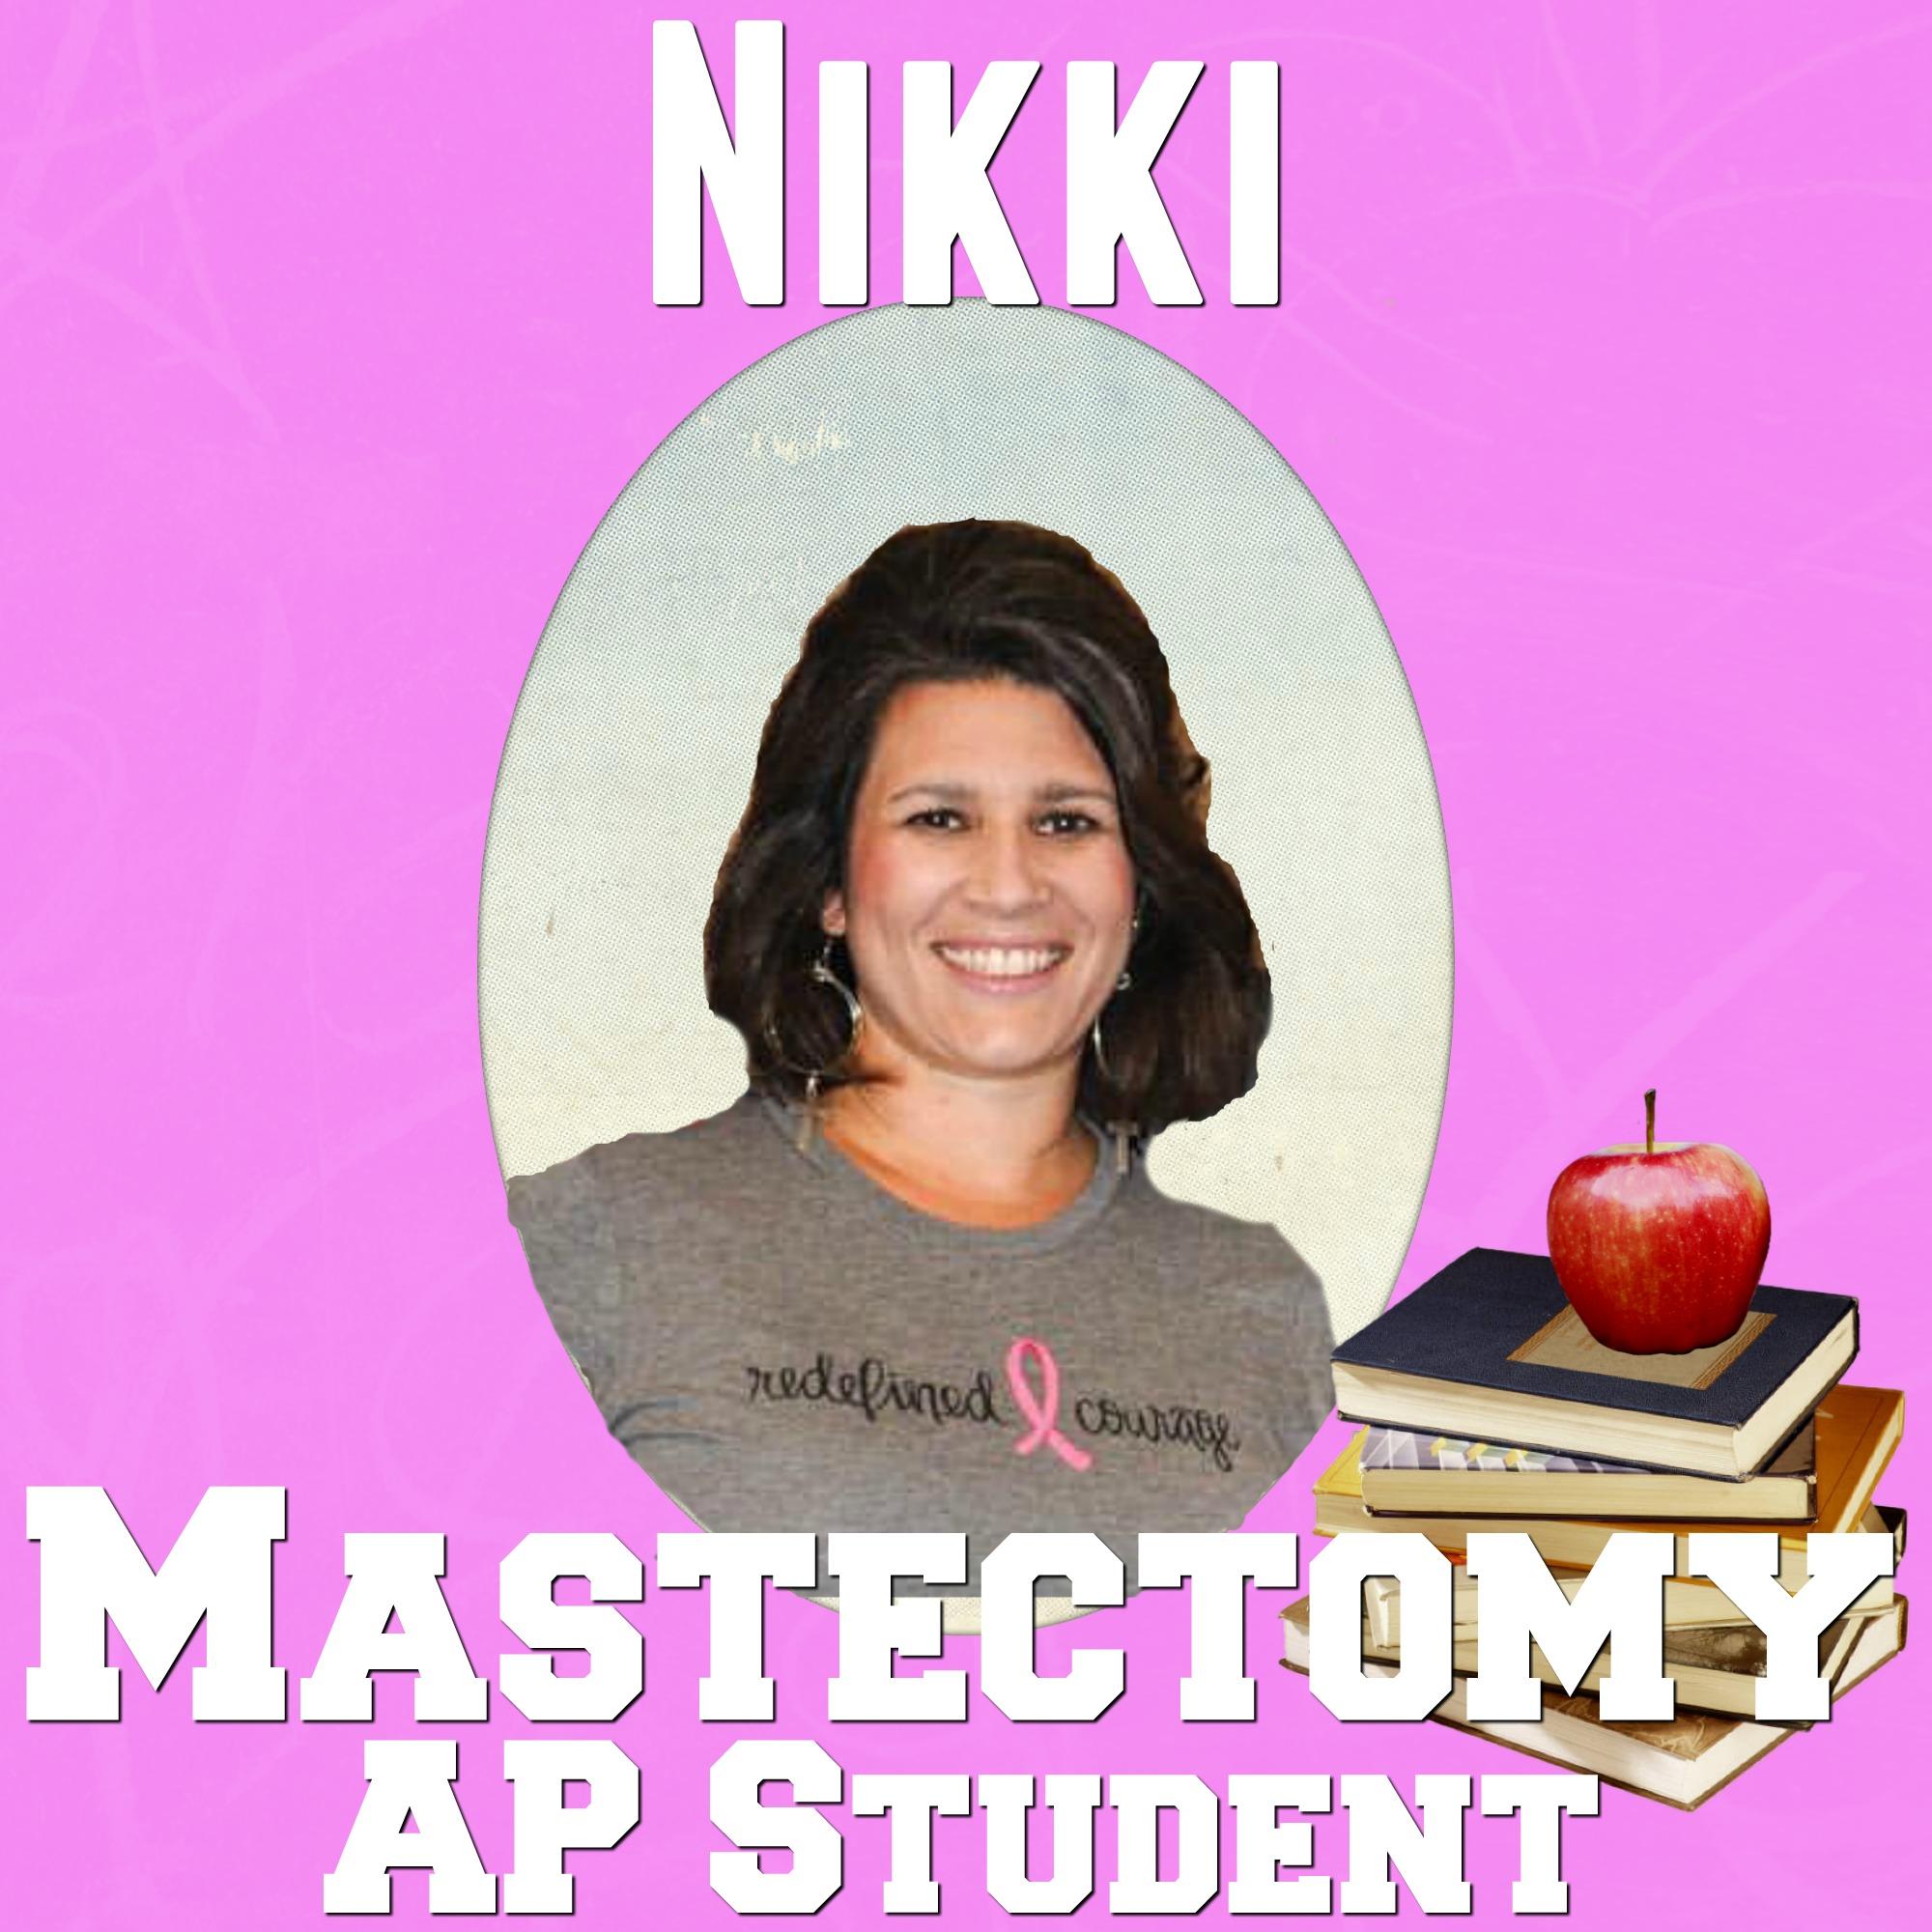 Nikki Previvor AP Student.jpg